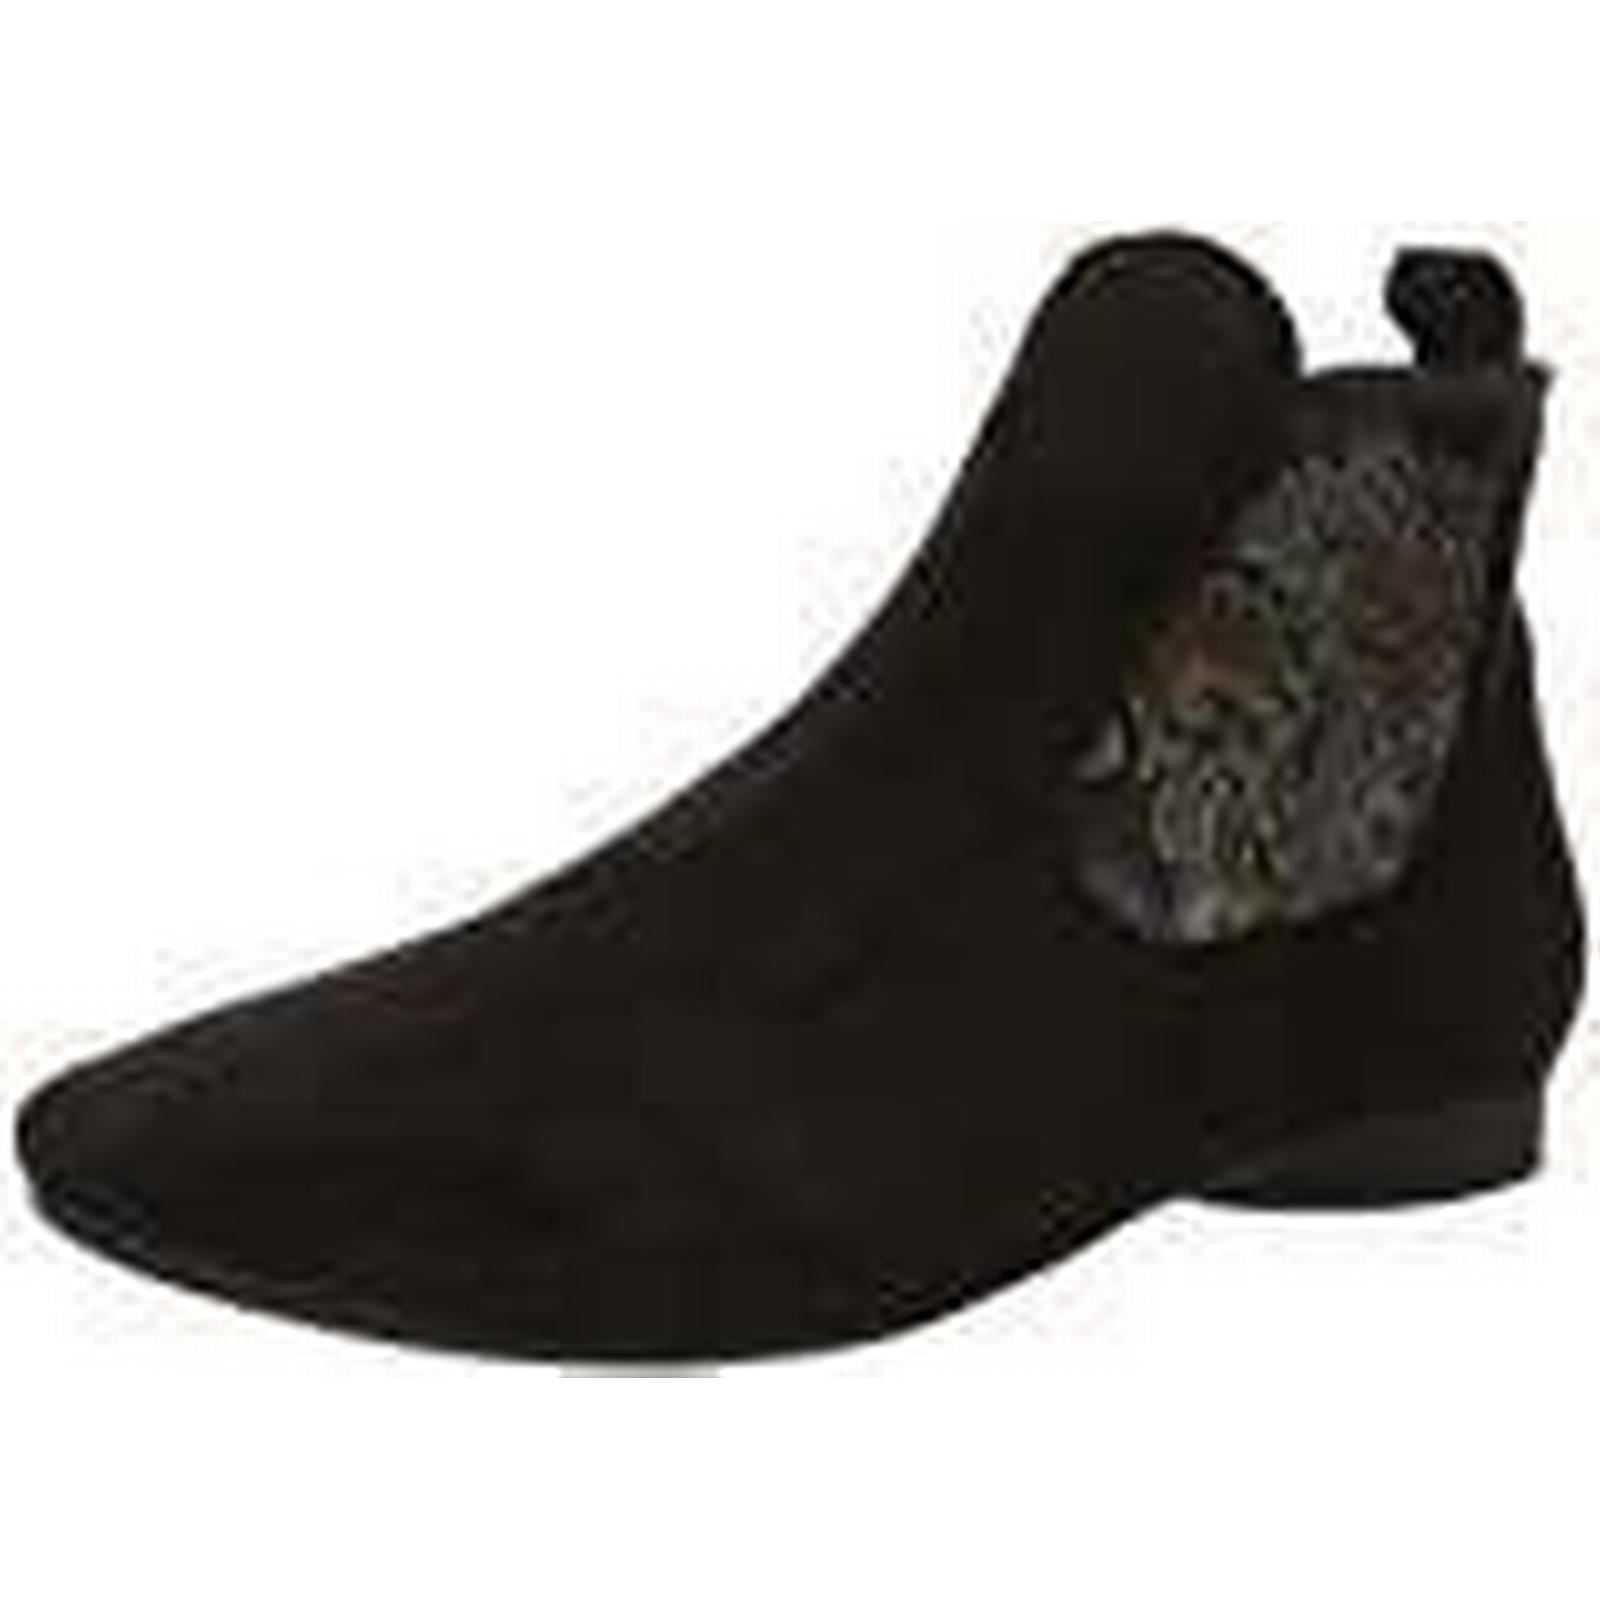 Think! Women's Guad_181295 Chelsea 5-5.5 Boots, Black SZ/Kombi 09, 5-5.5 Chelsea UK 5.5 UK 9ebe13